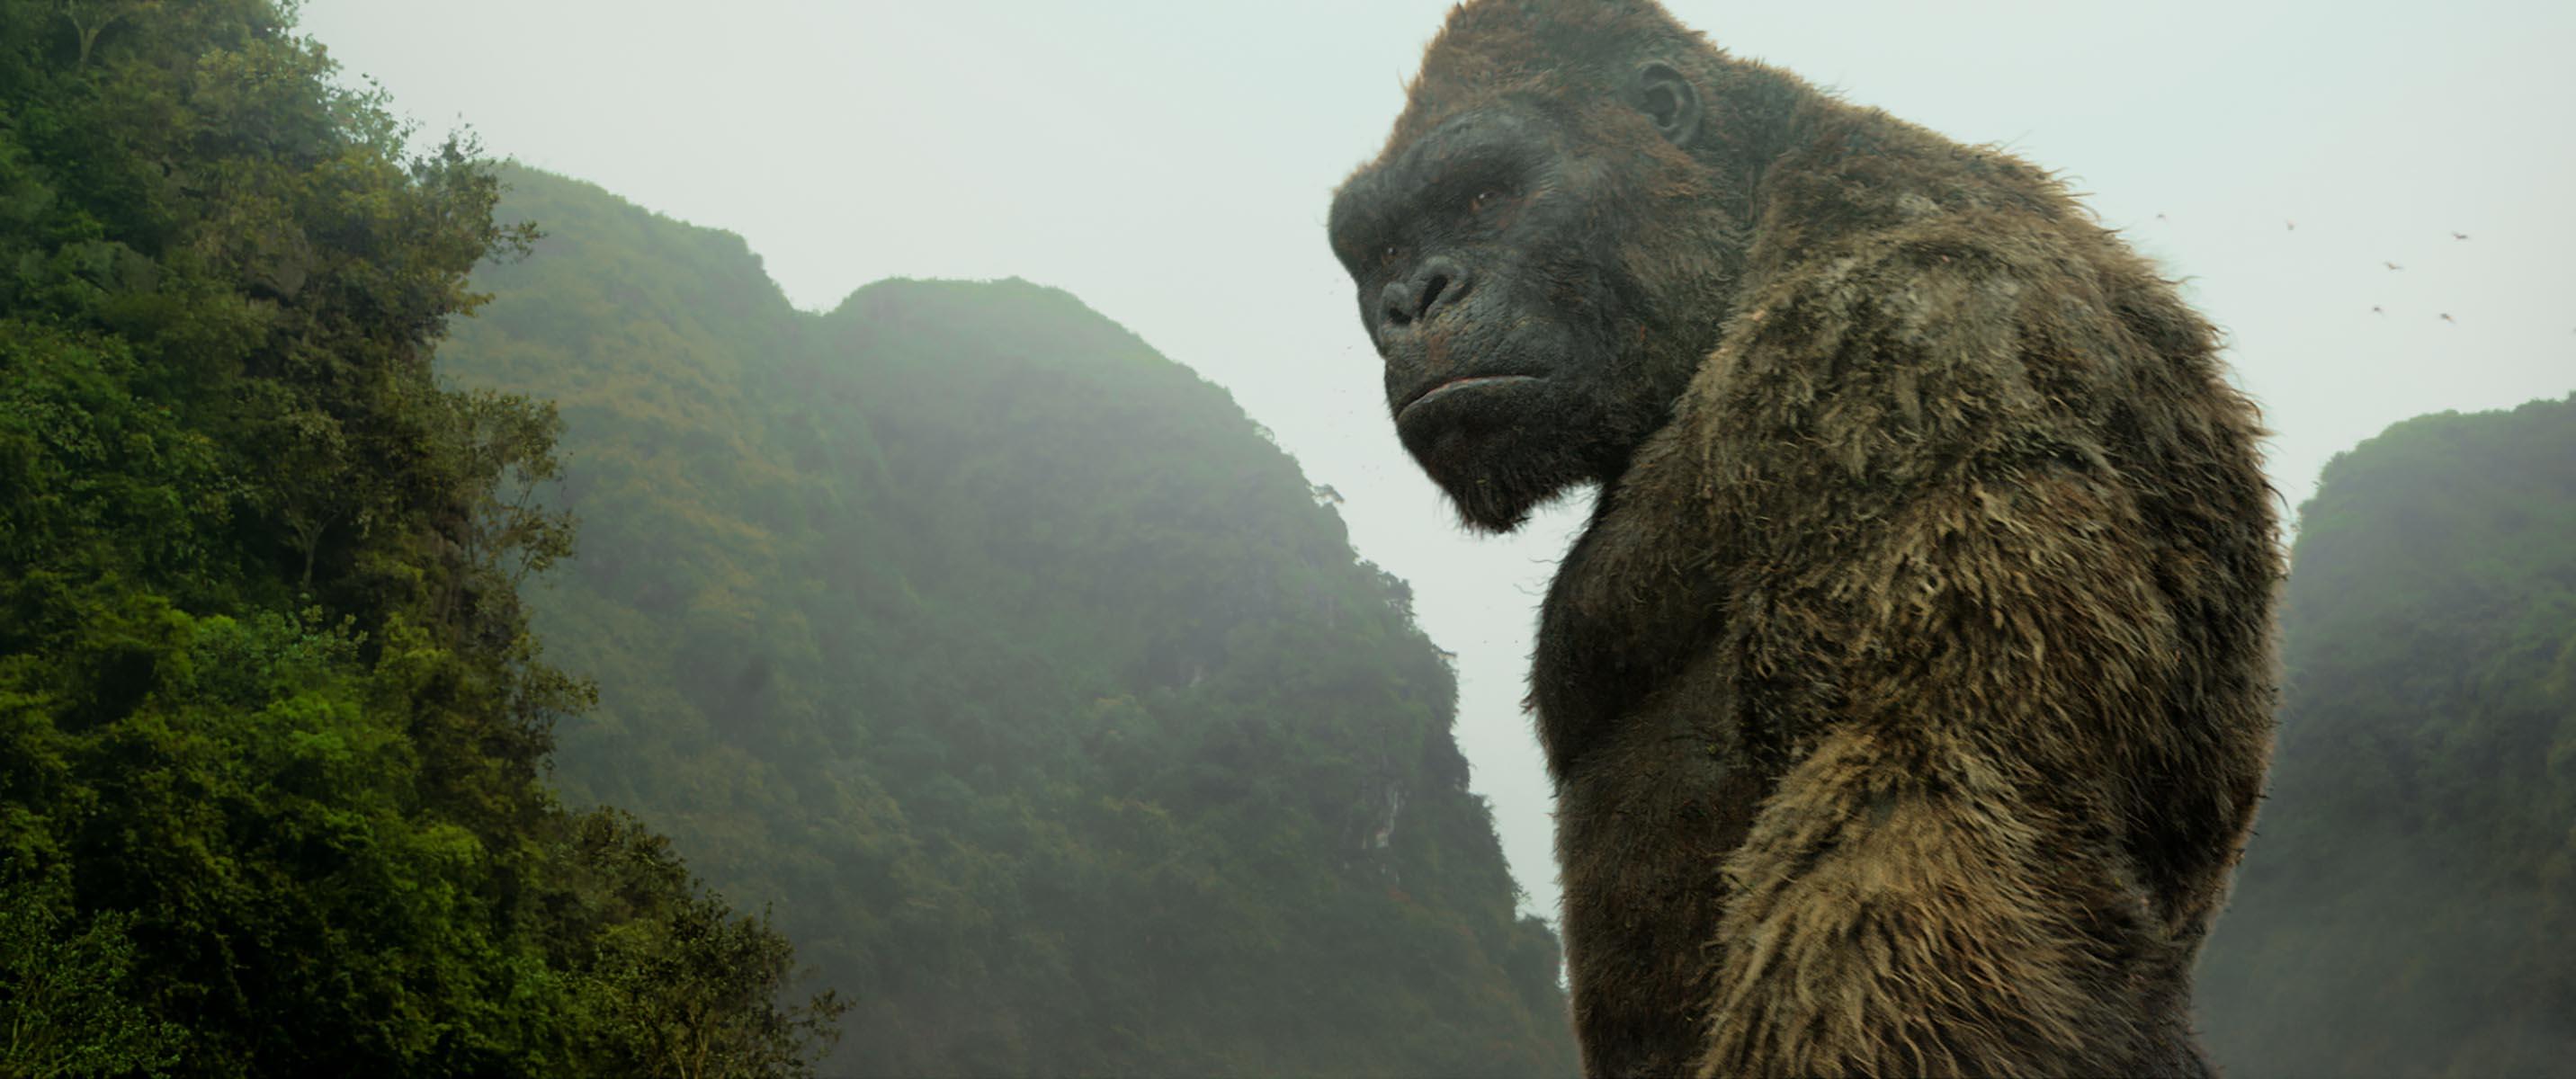 WarnerMedia Turned Down $200 Million Netflix Offer for 'Godzilla vs. Kong,' Eyes HBO Max — Report - IndieWire